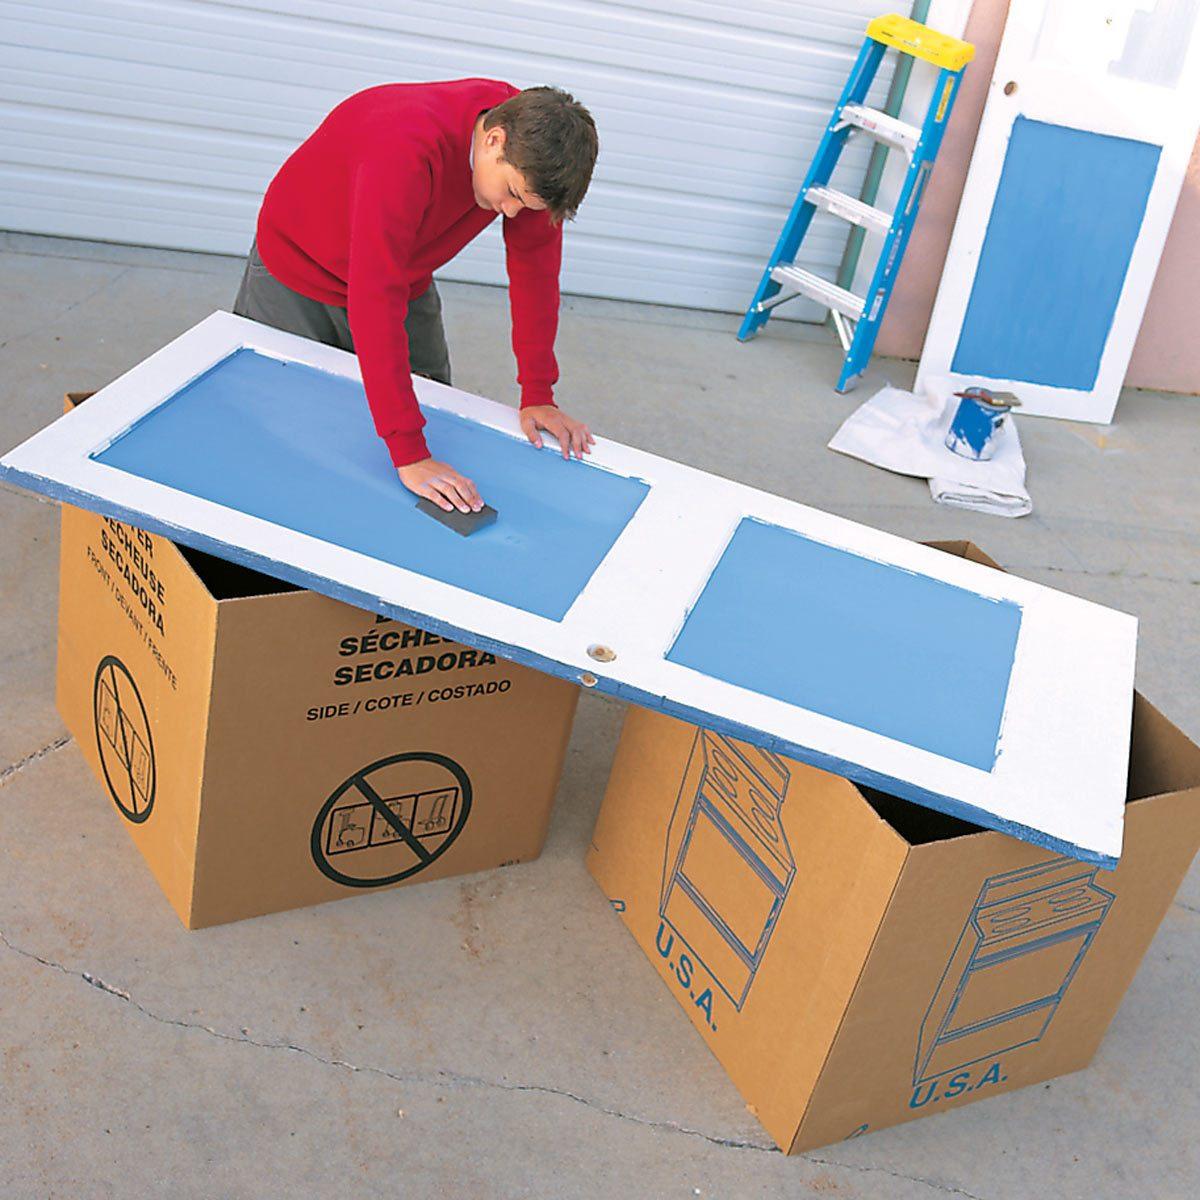 cardboard box sawhorses